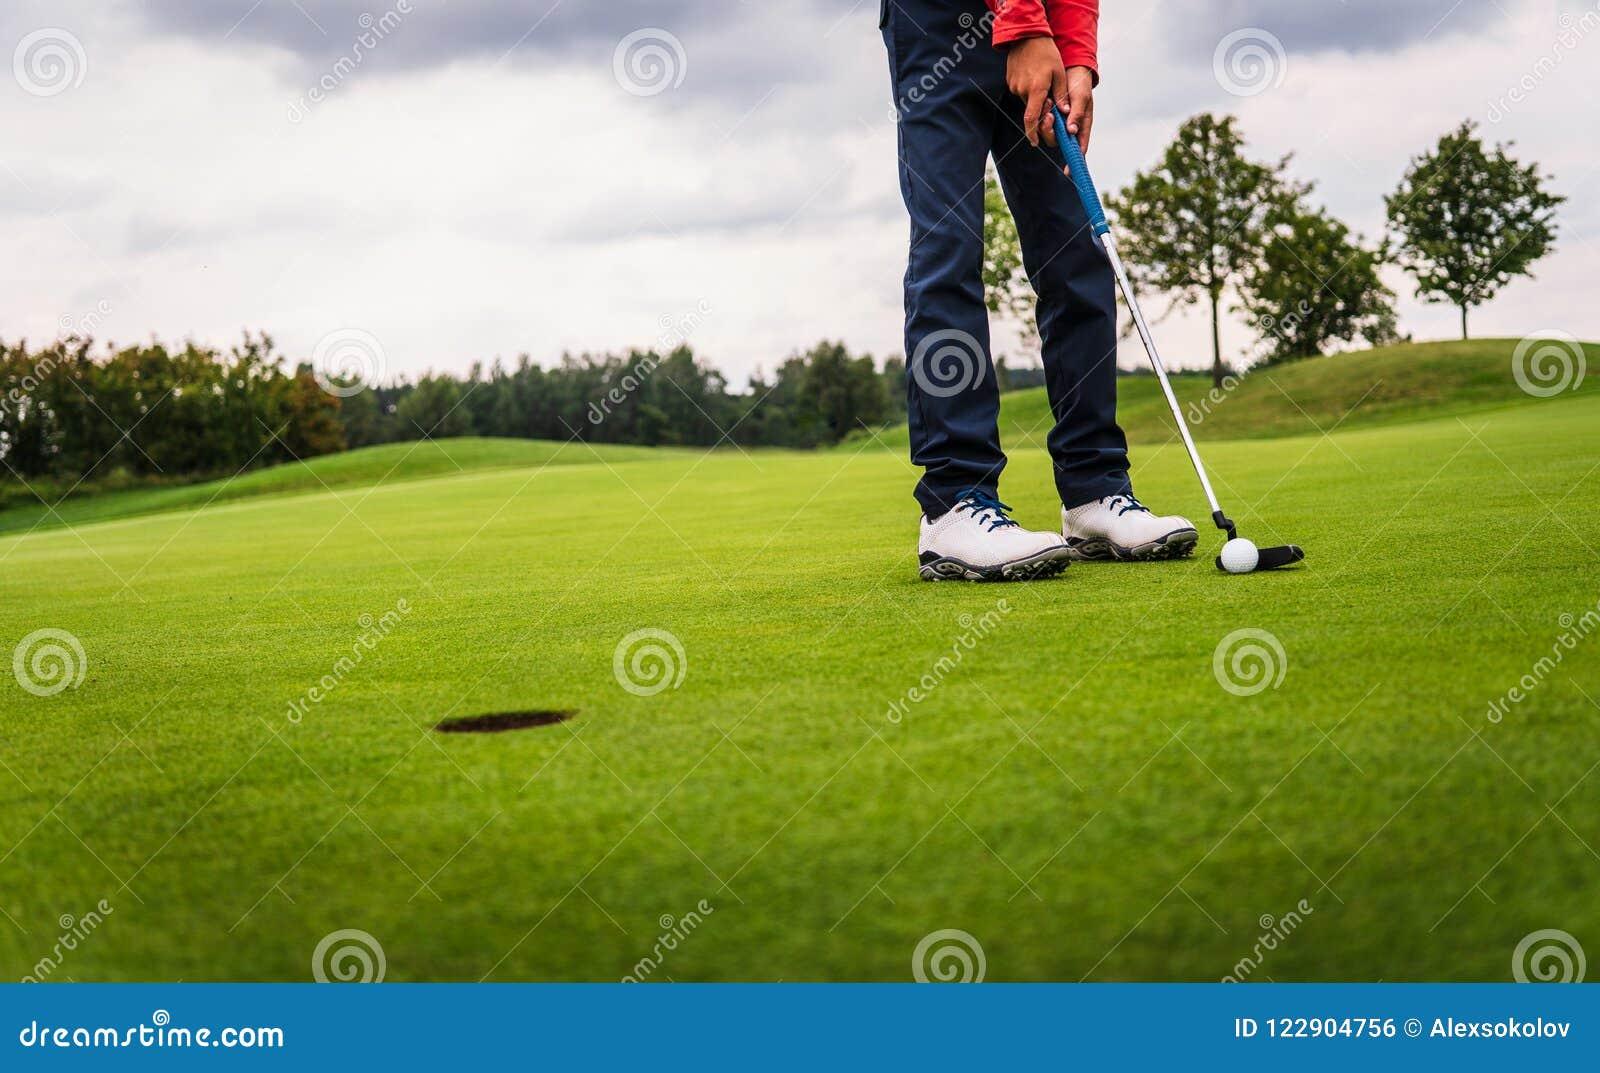 Golf hit on green